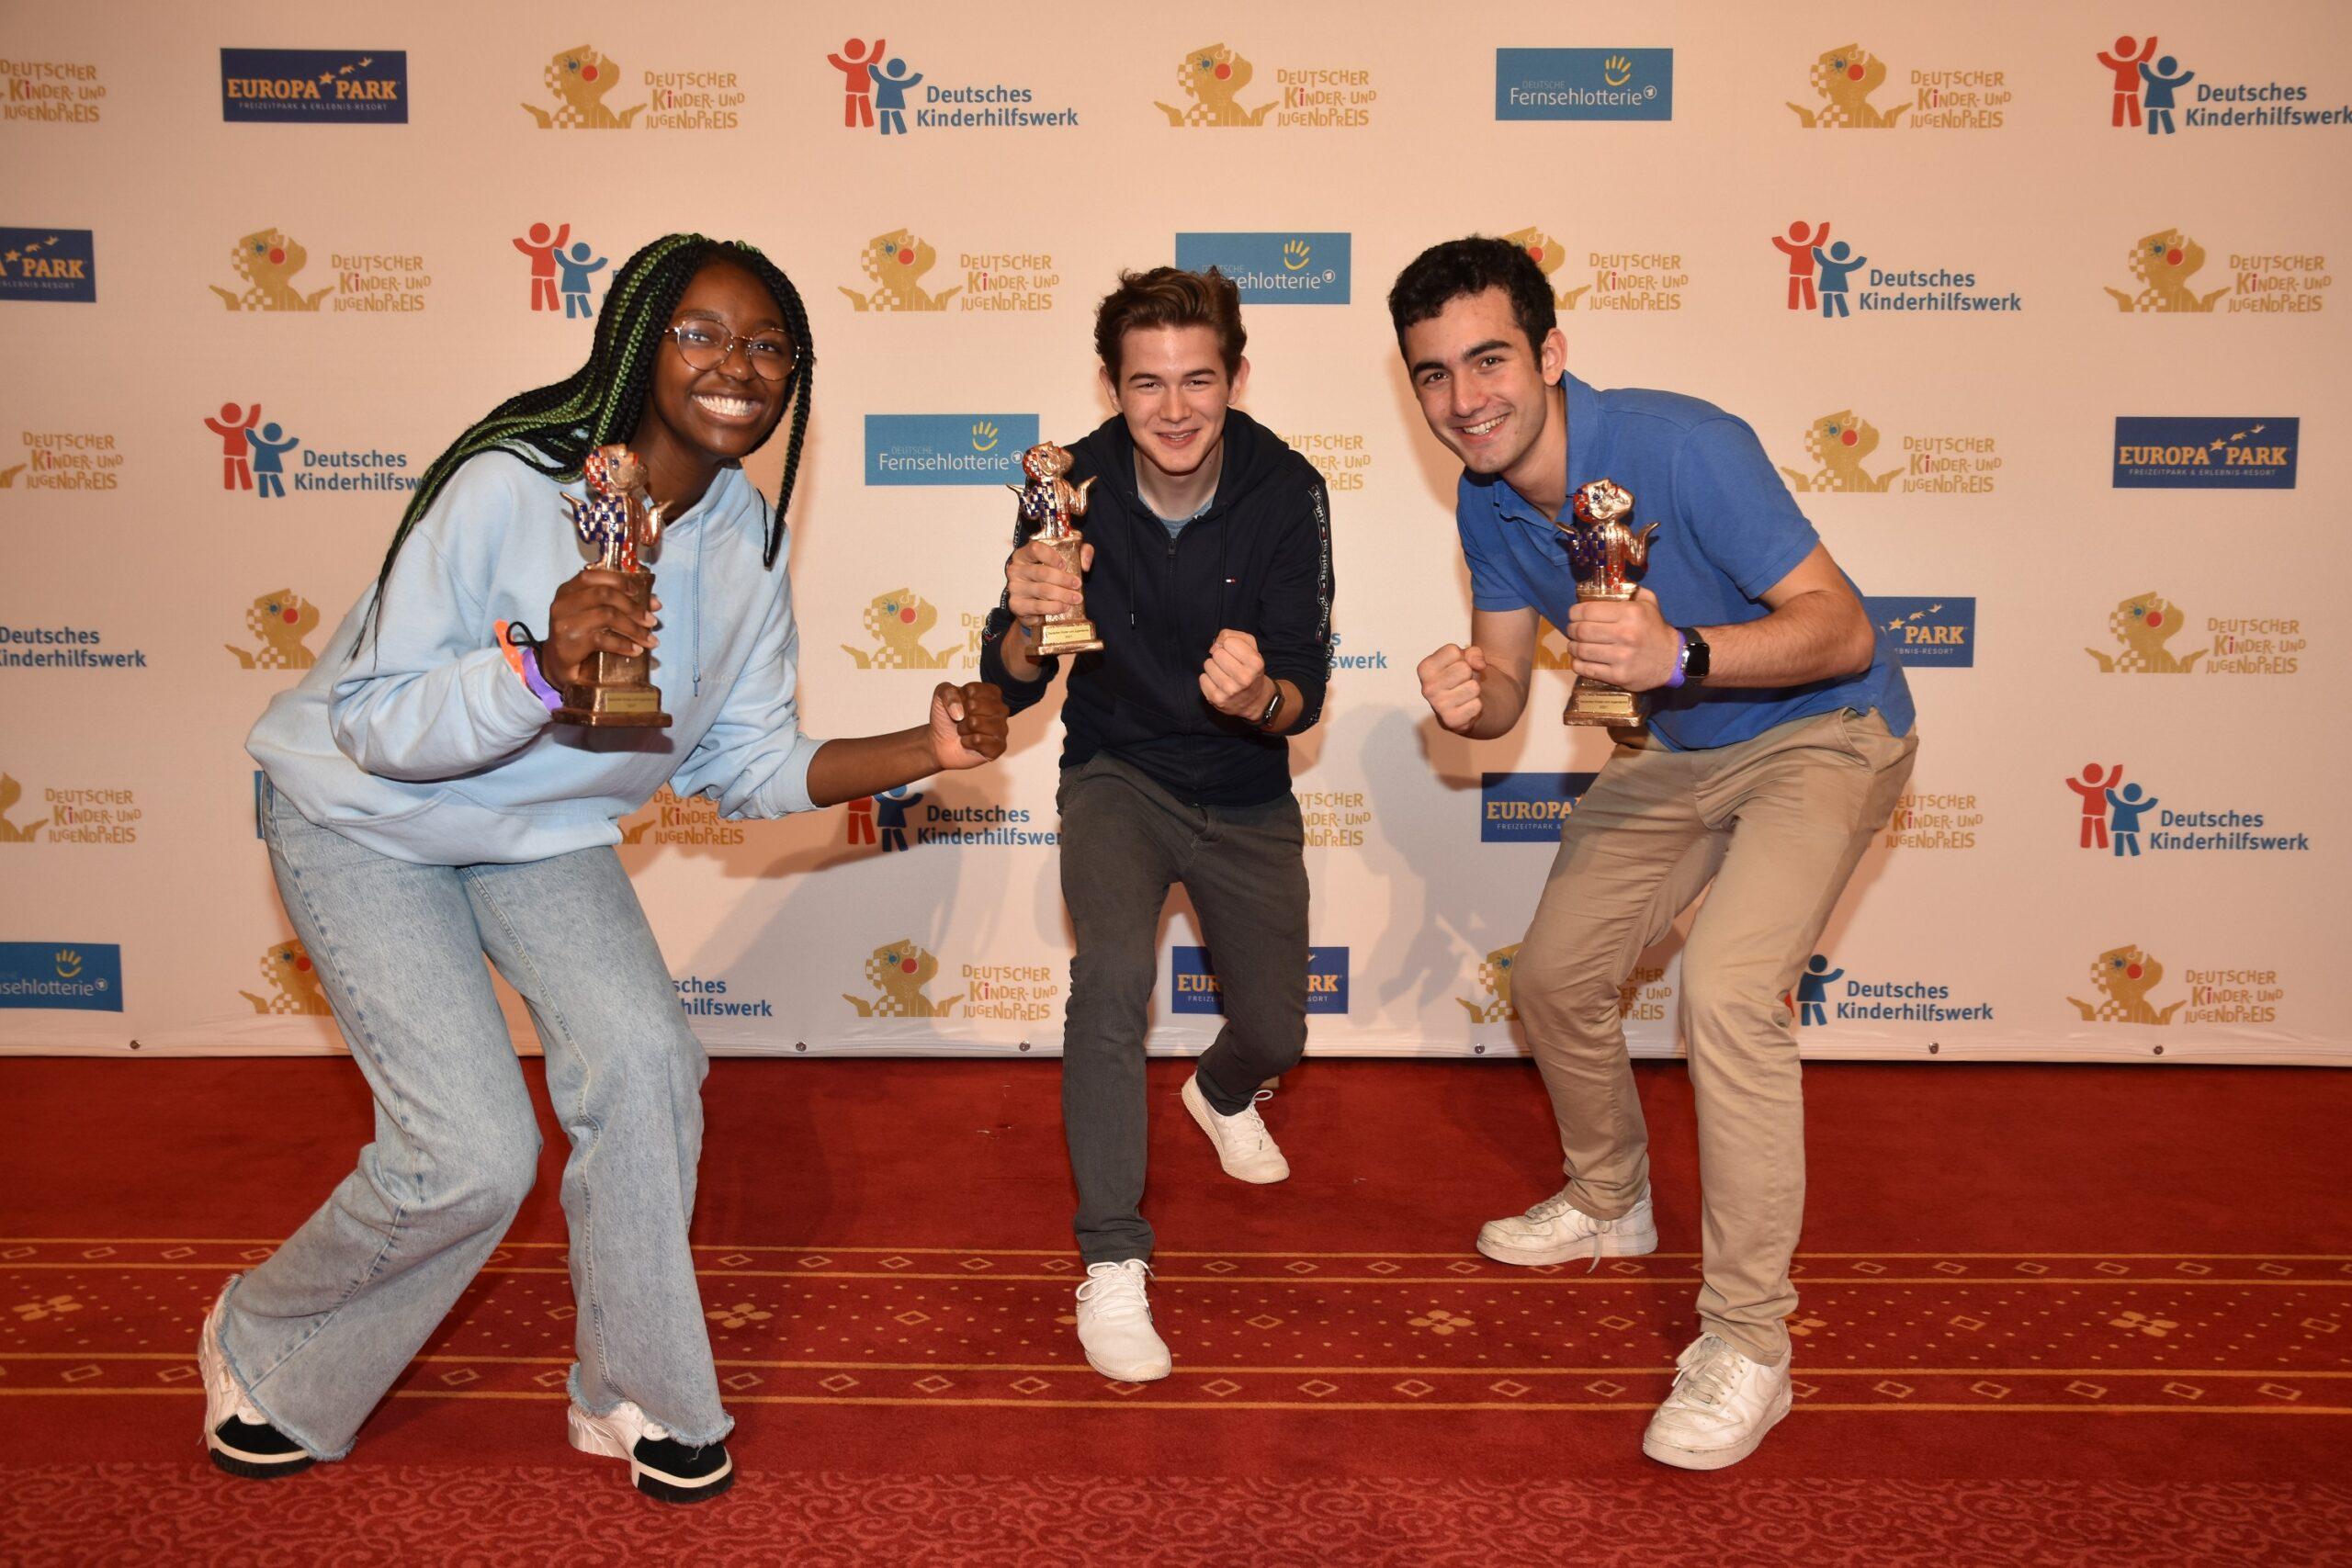 Vivien (Barlach GoYoung), Moritz (The GreenClub) und Noah (CoronaPort) (von links nach rechts). Copyright: Lisa Fischer